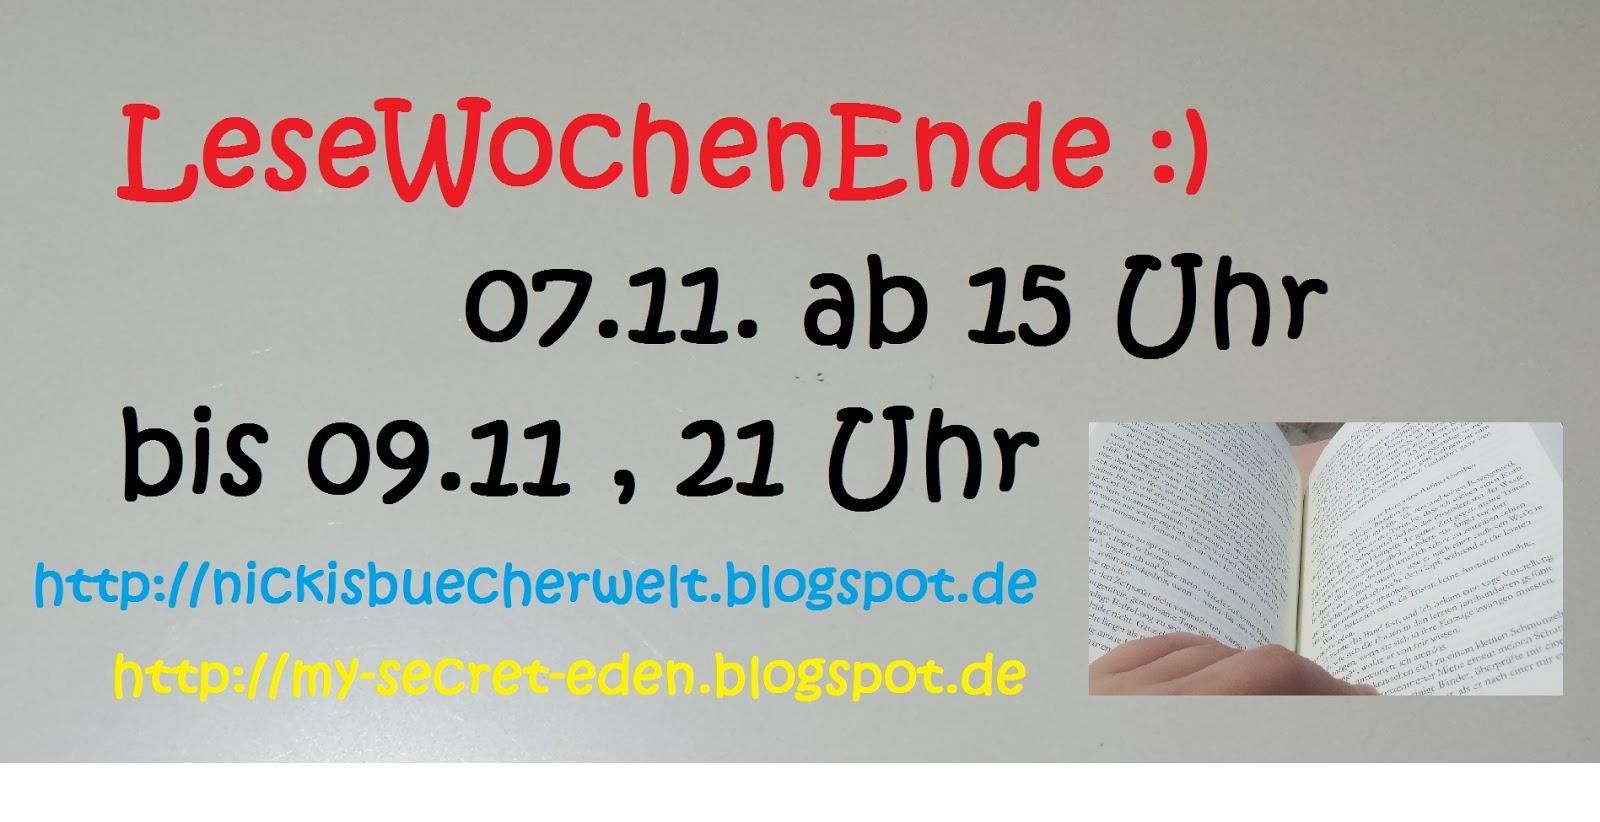 [Lesewochenende] 07.11.14 bis 09.11.14 – Tag #01